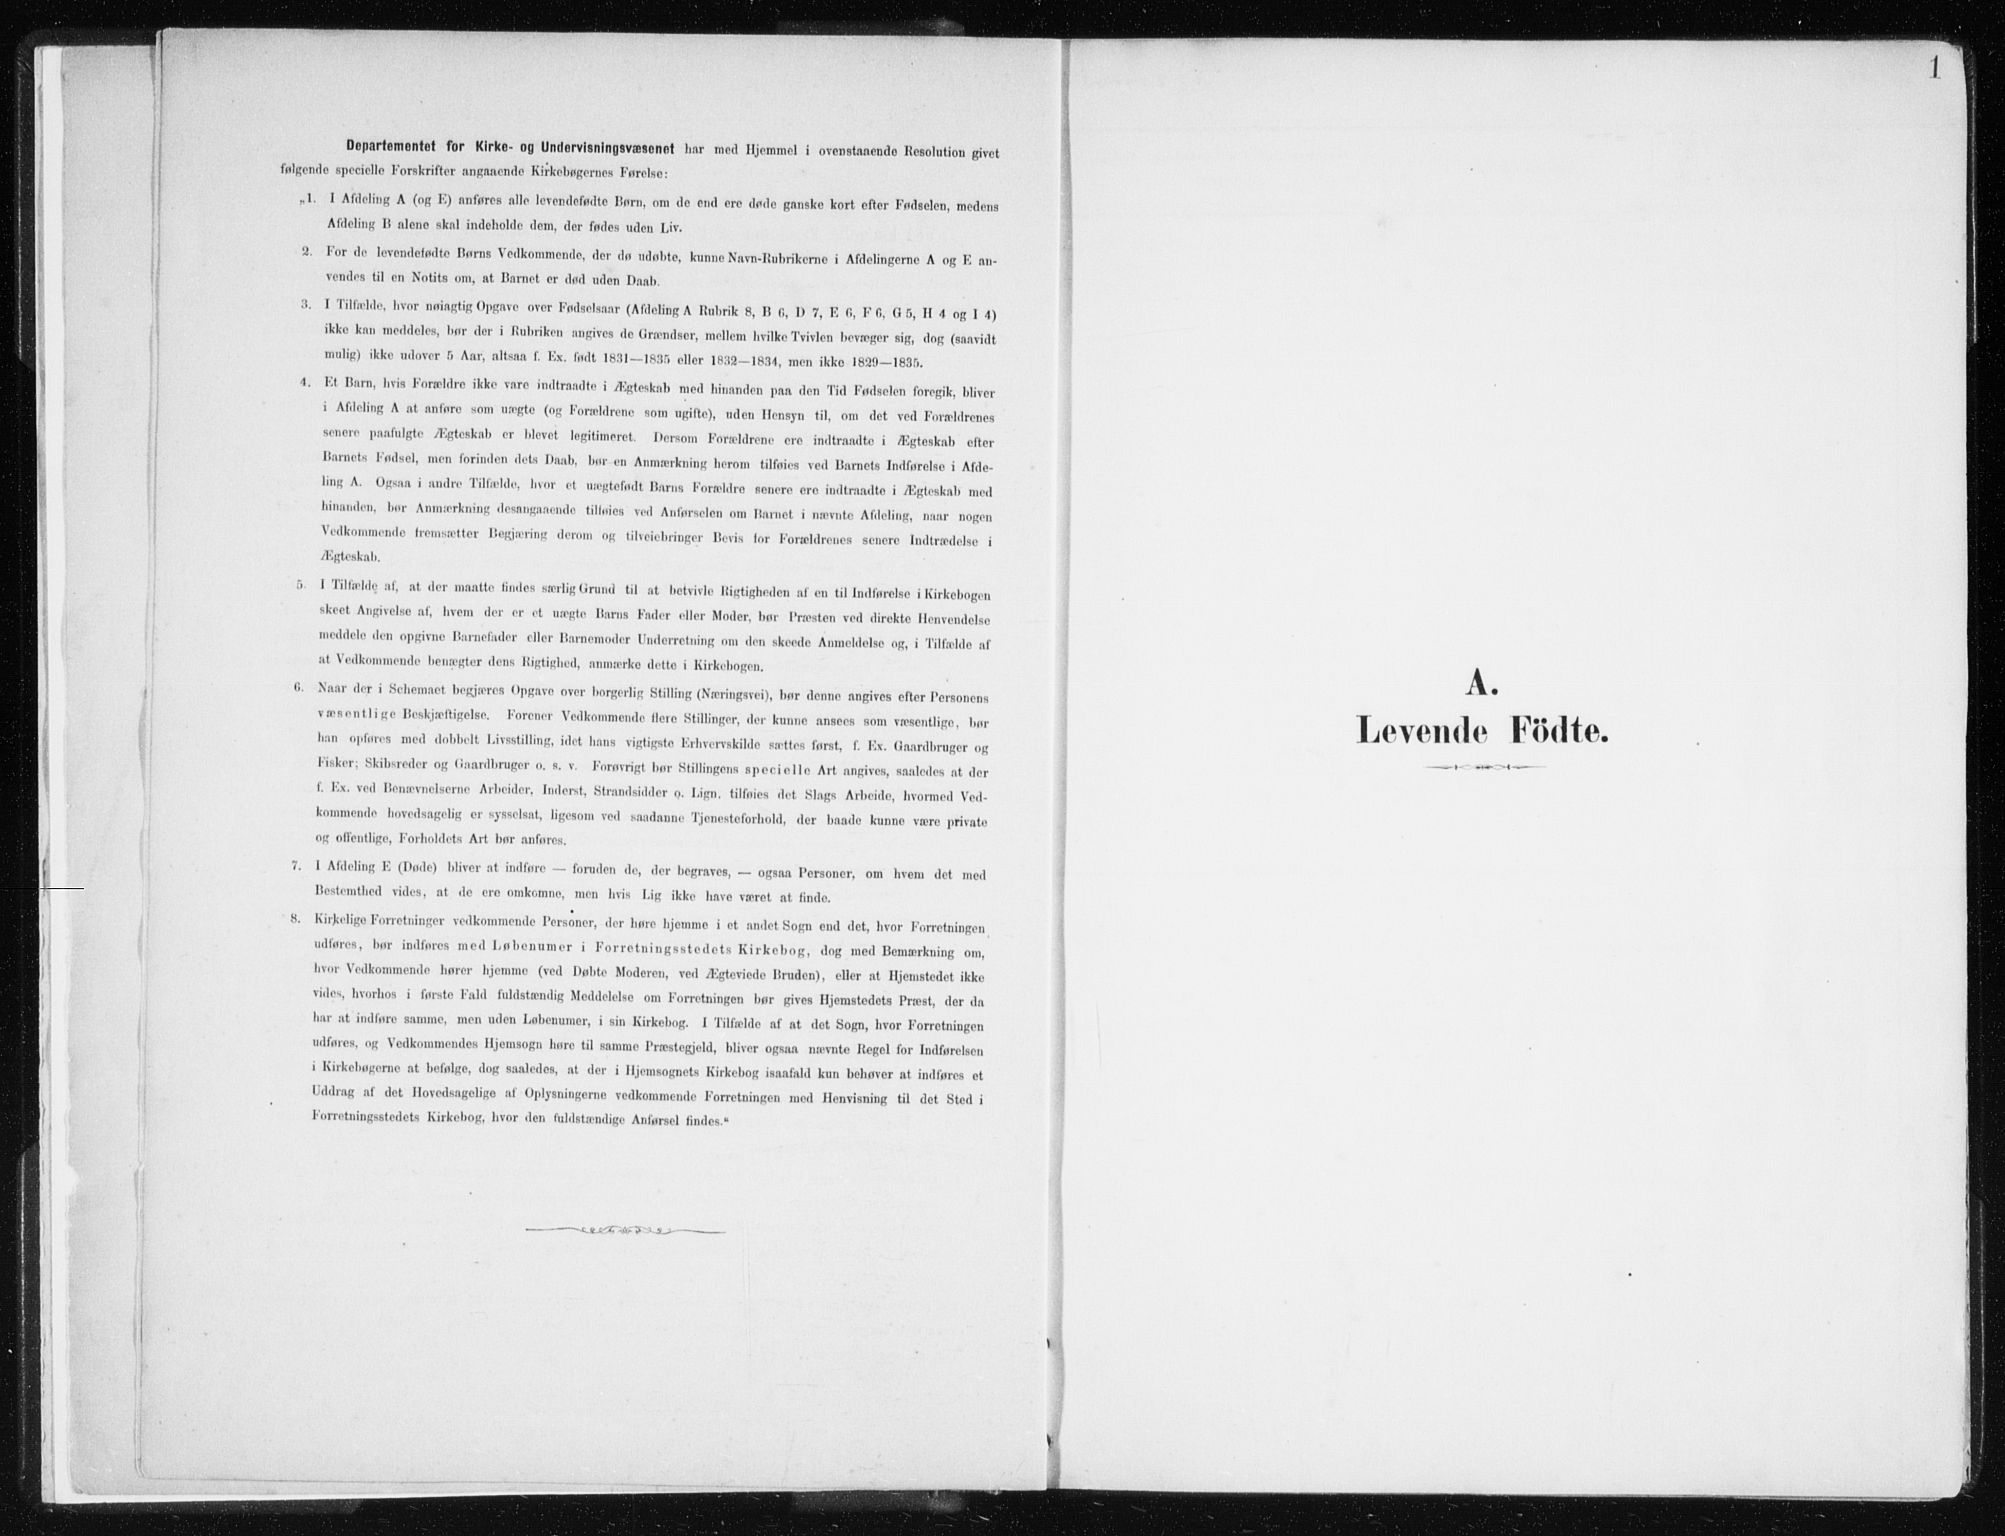 SATØ, Lyngen sokneprestembete, Ministerialbok nr. 10, 1883-1904, s. 1